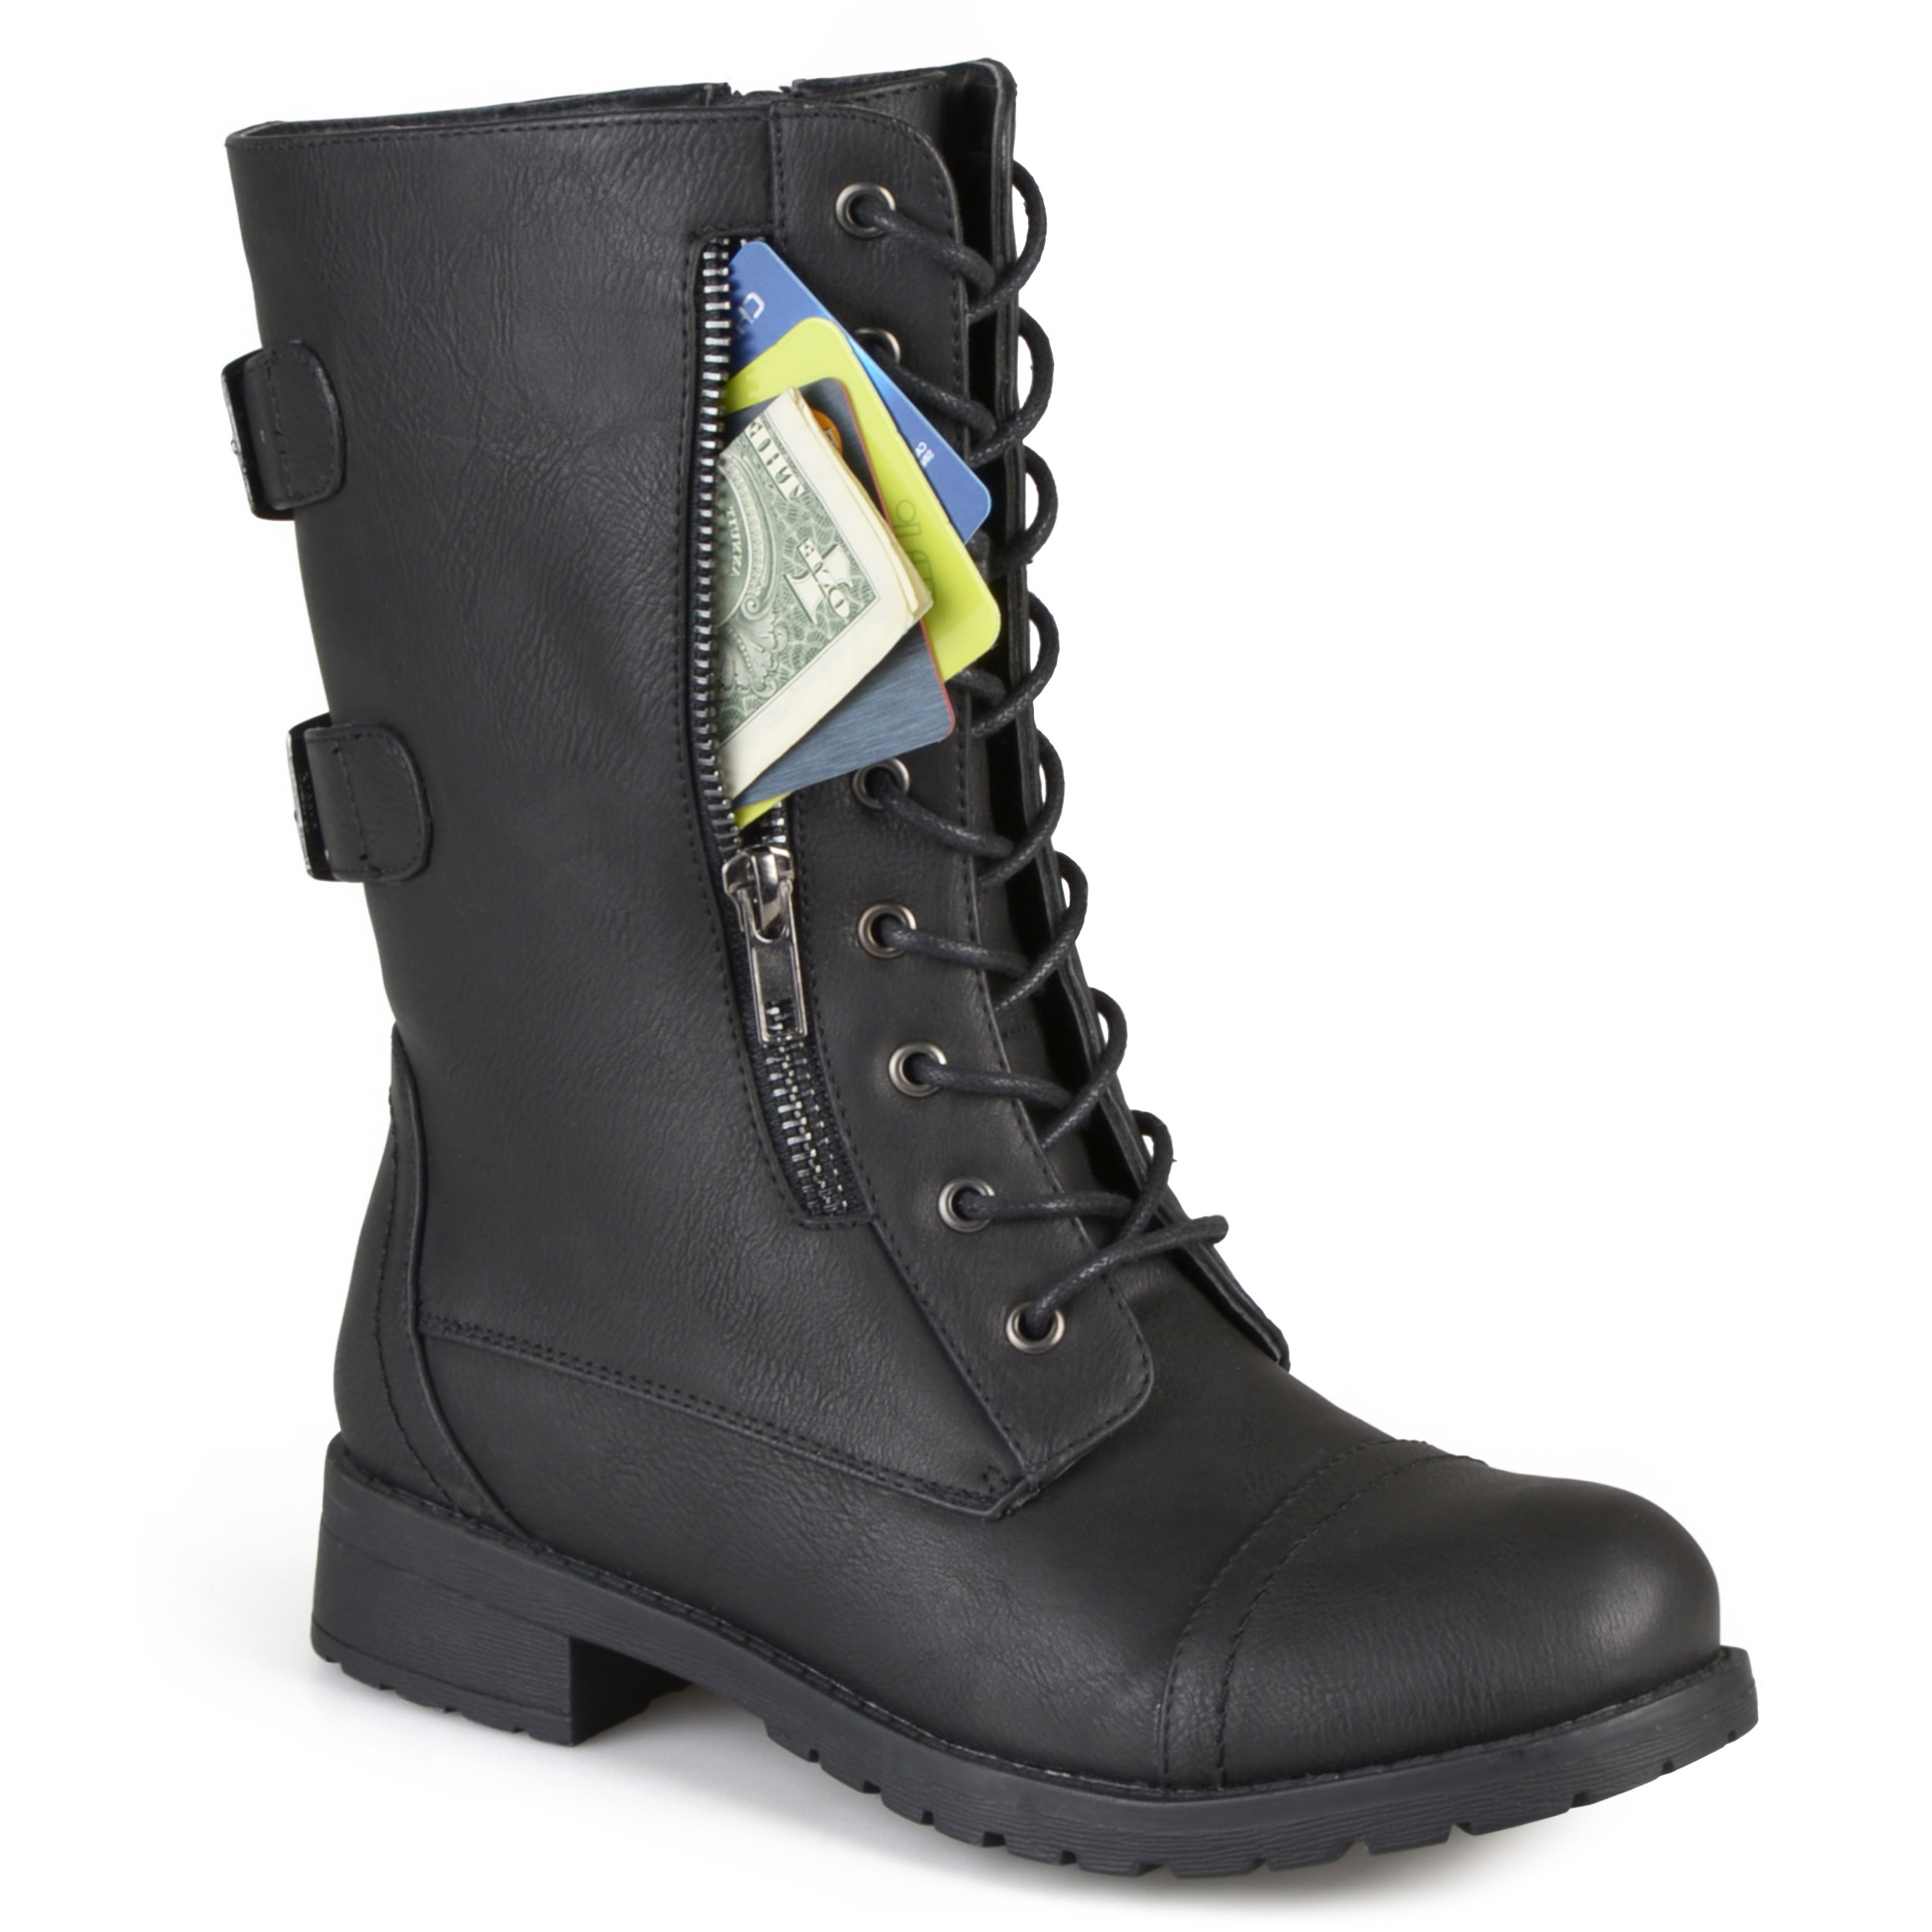 Women's Tasseled Round Toe Boots